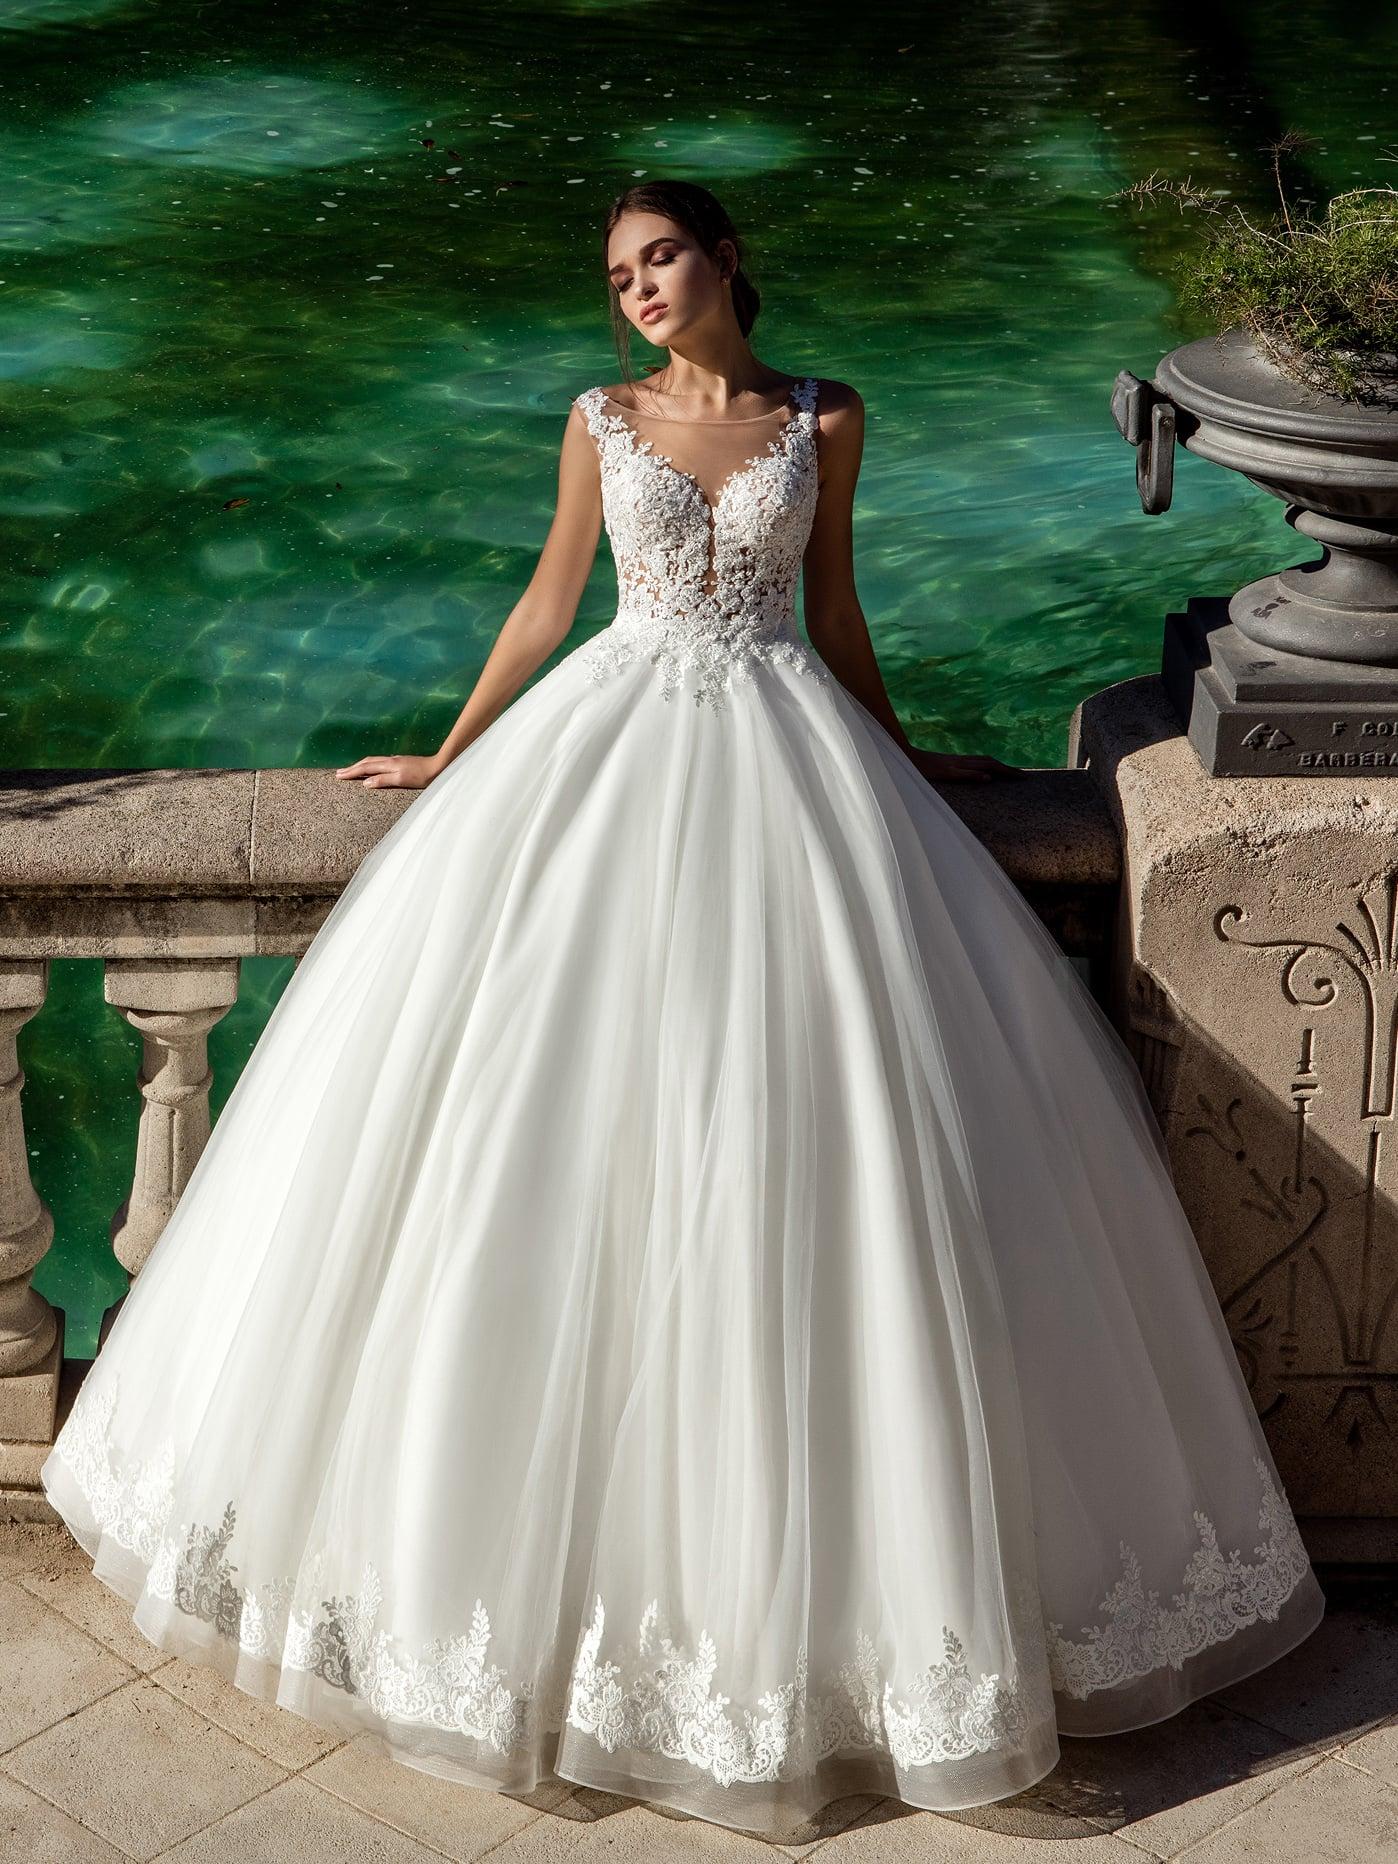 d2a0ecbb043 Свадебное Платье Шикарное Фото